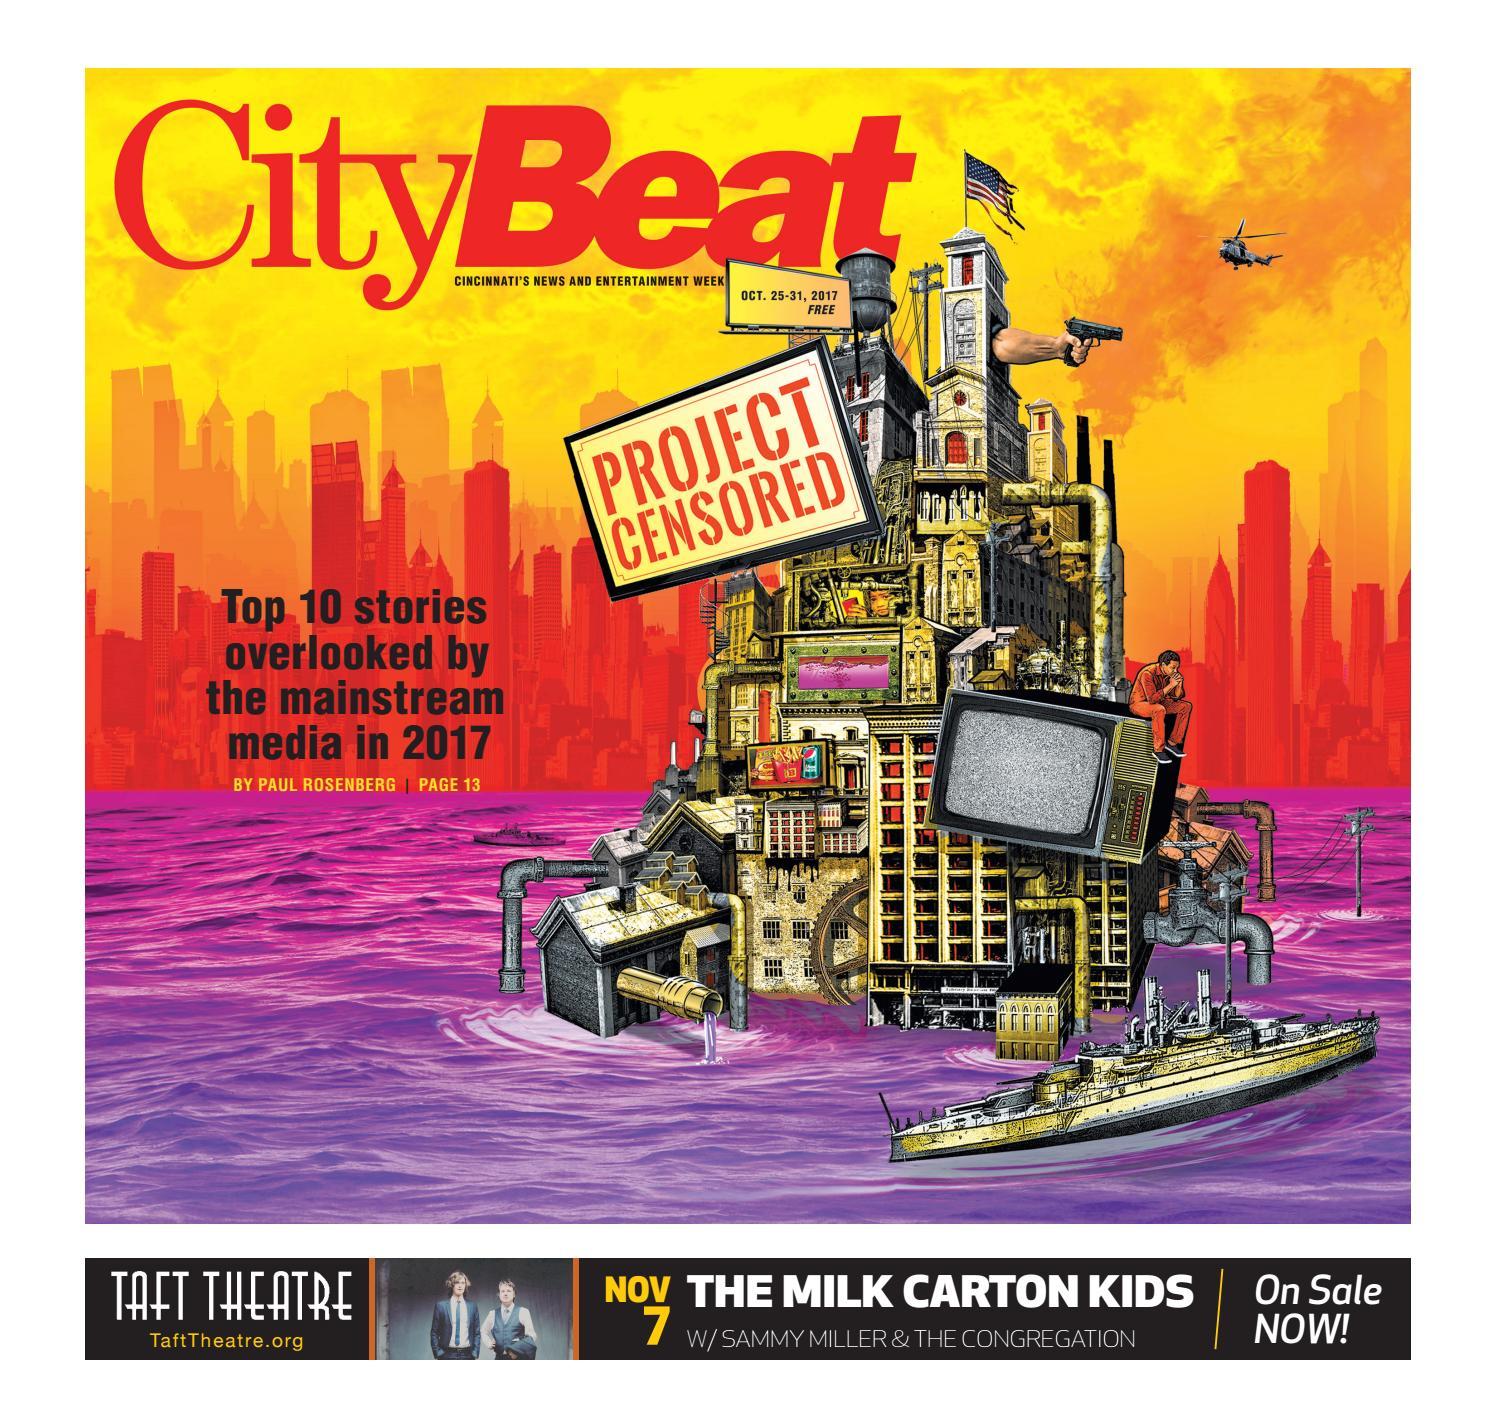 CityBeat Oct  25, 2017 by Cincinnati CityBeat - issuu